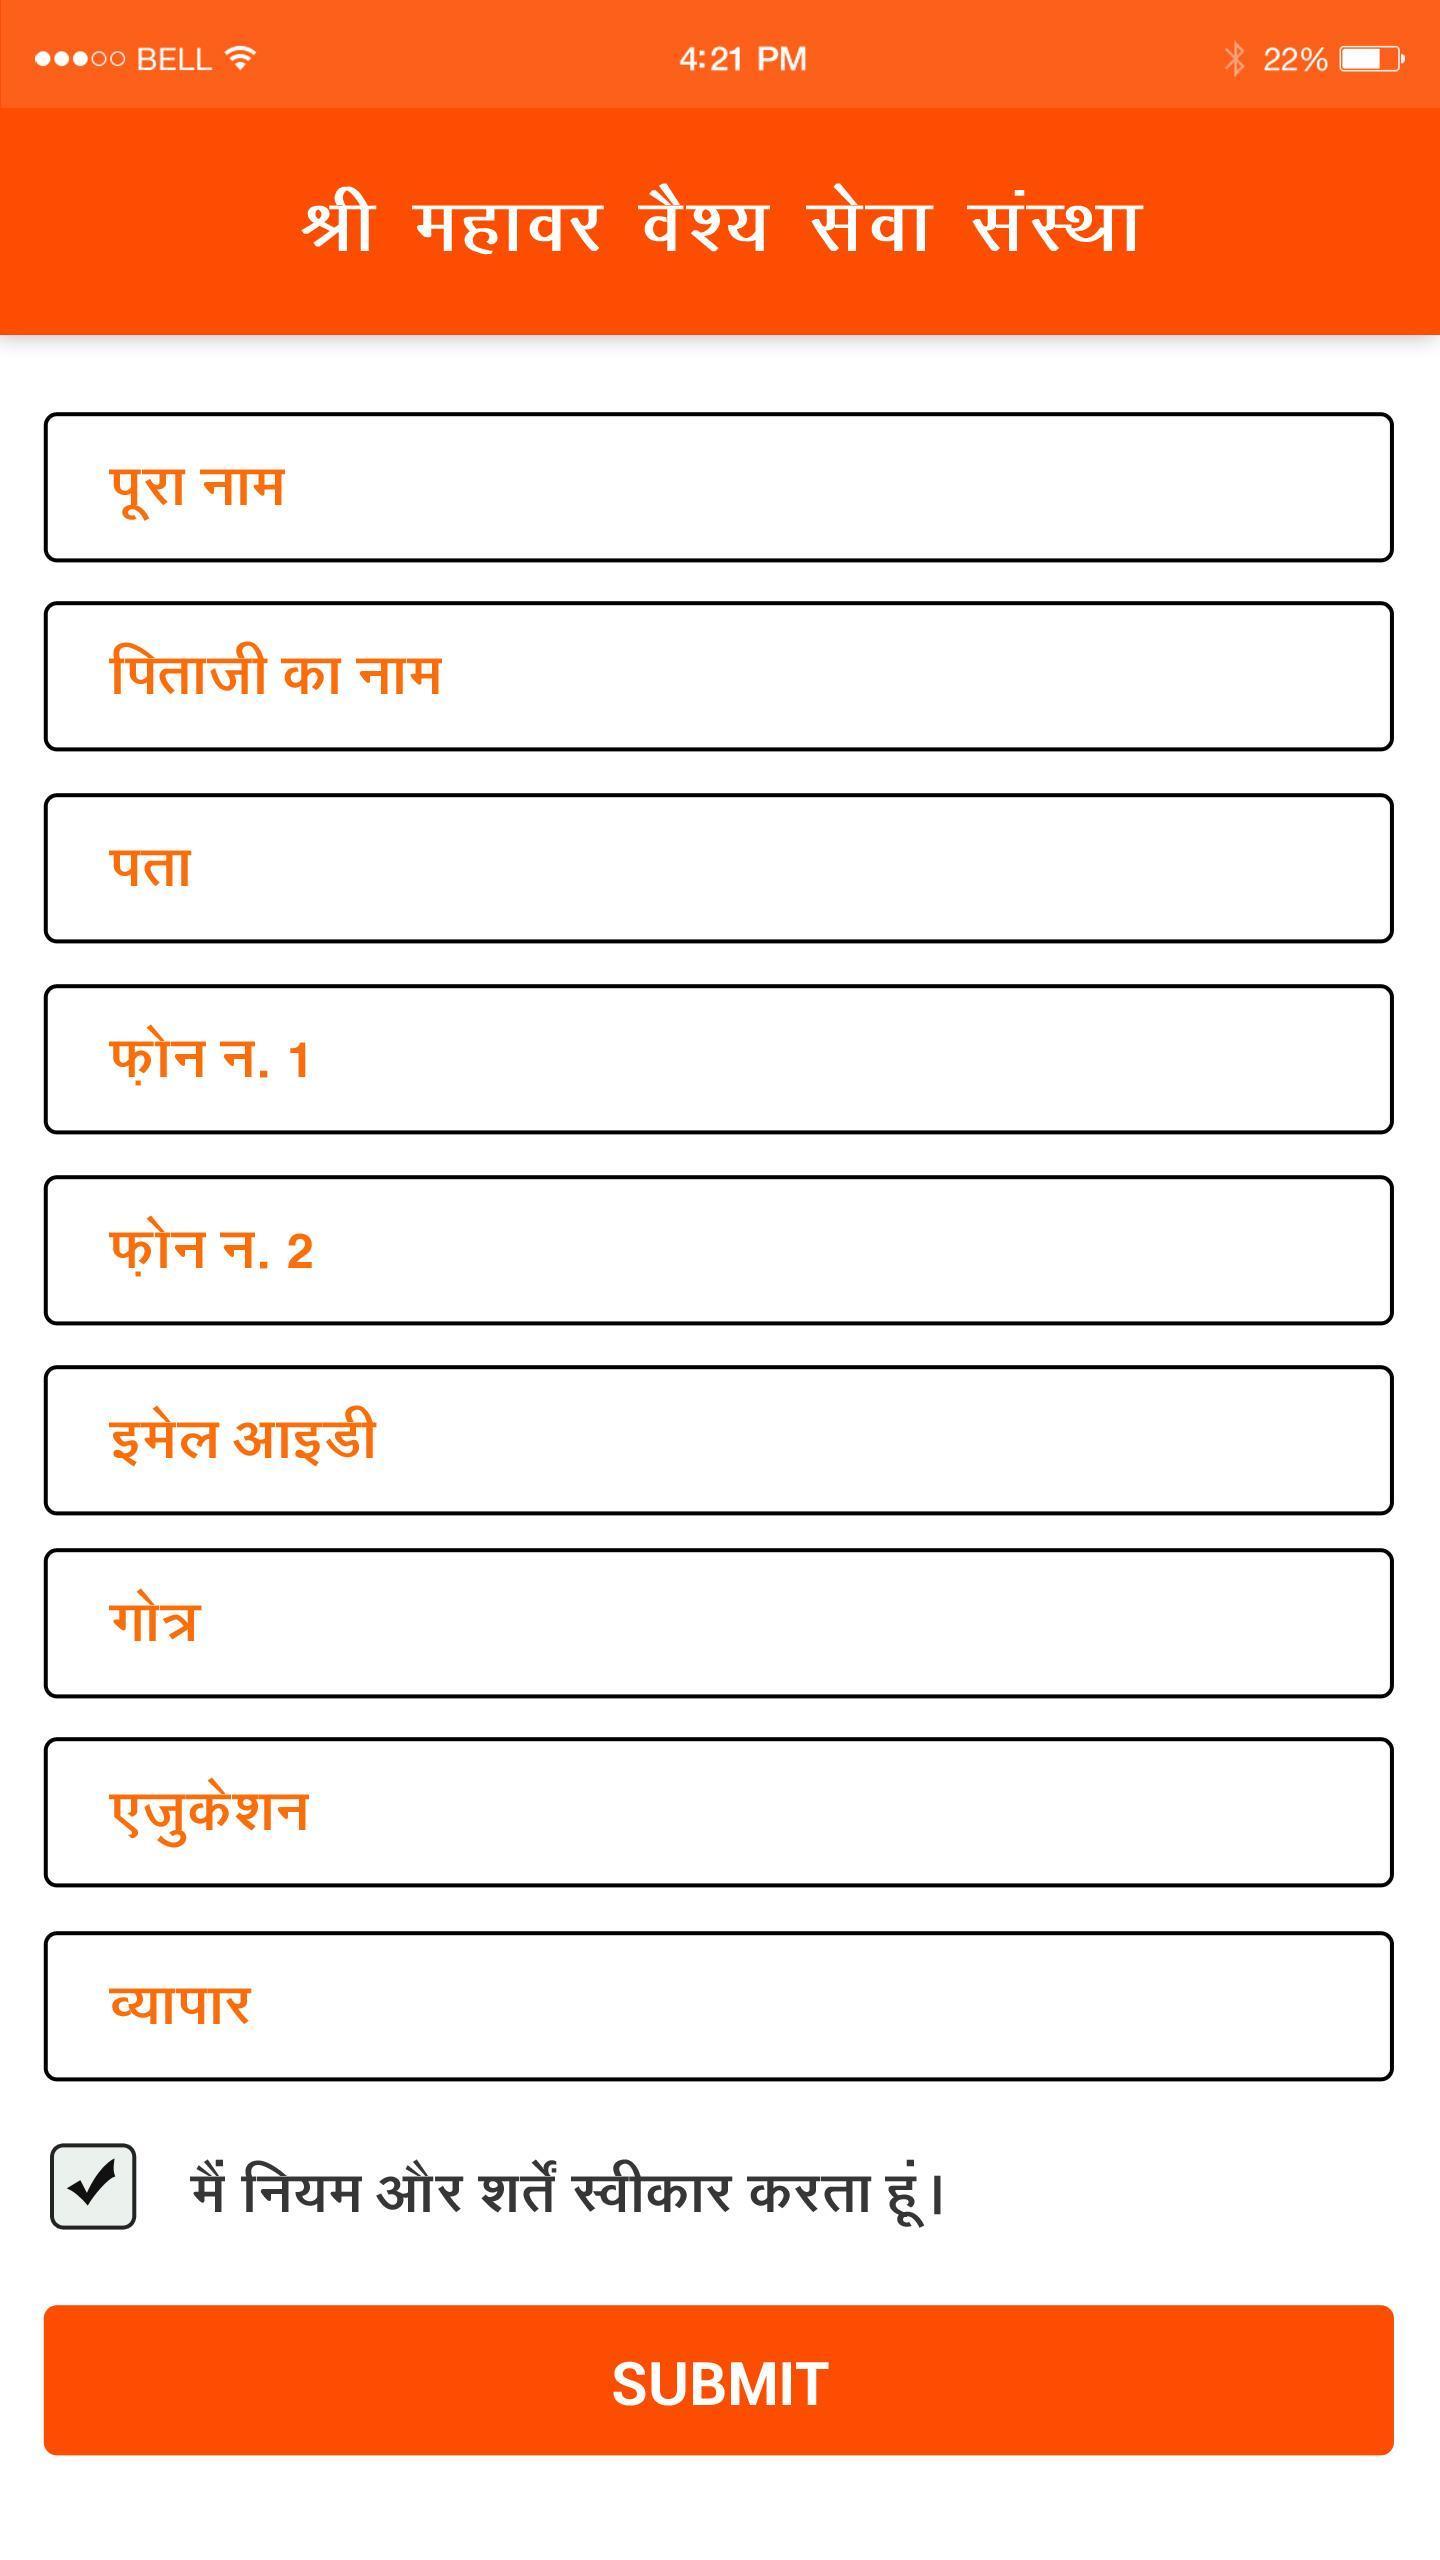 Mahawar Vaish for Android - APK Download